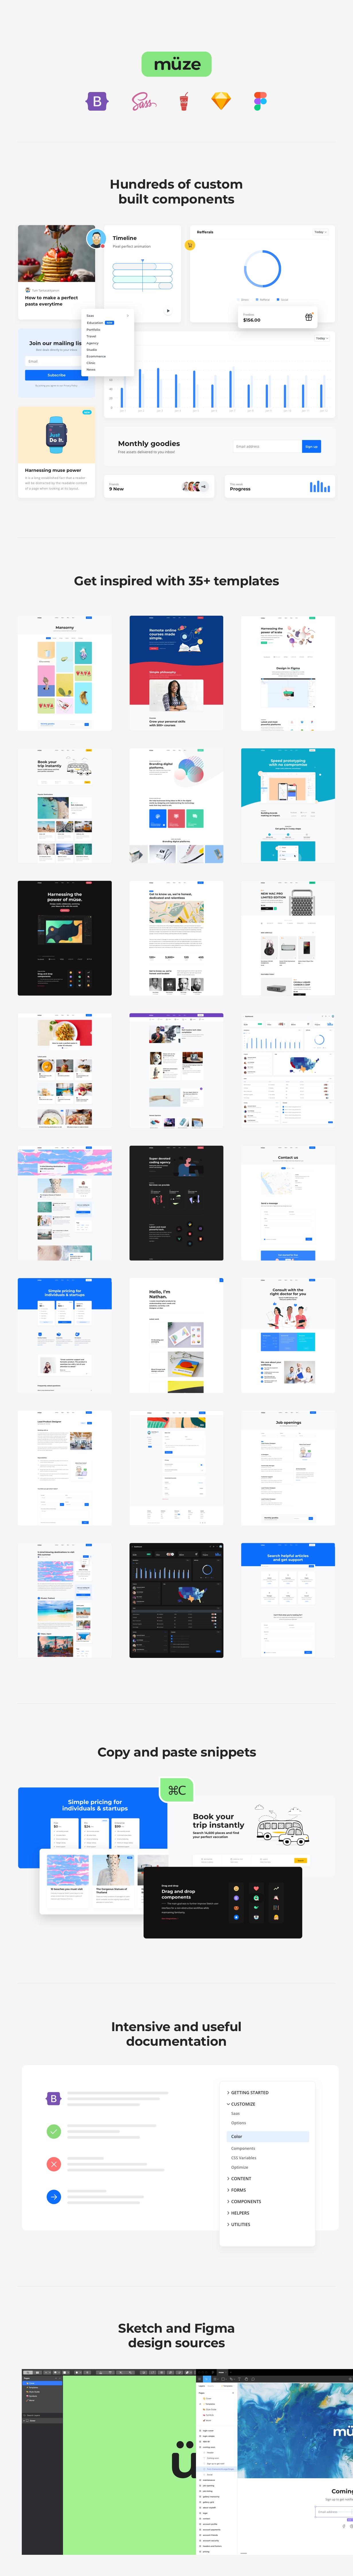 Muze - Multi-Purpose HTML5 Template - 1